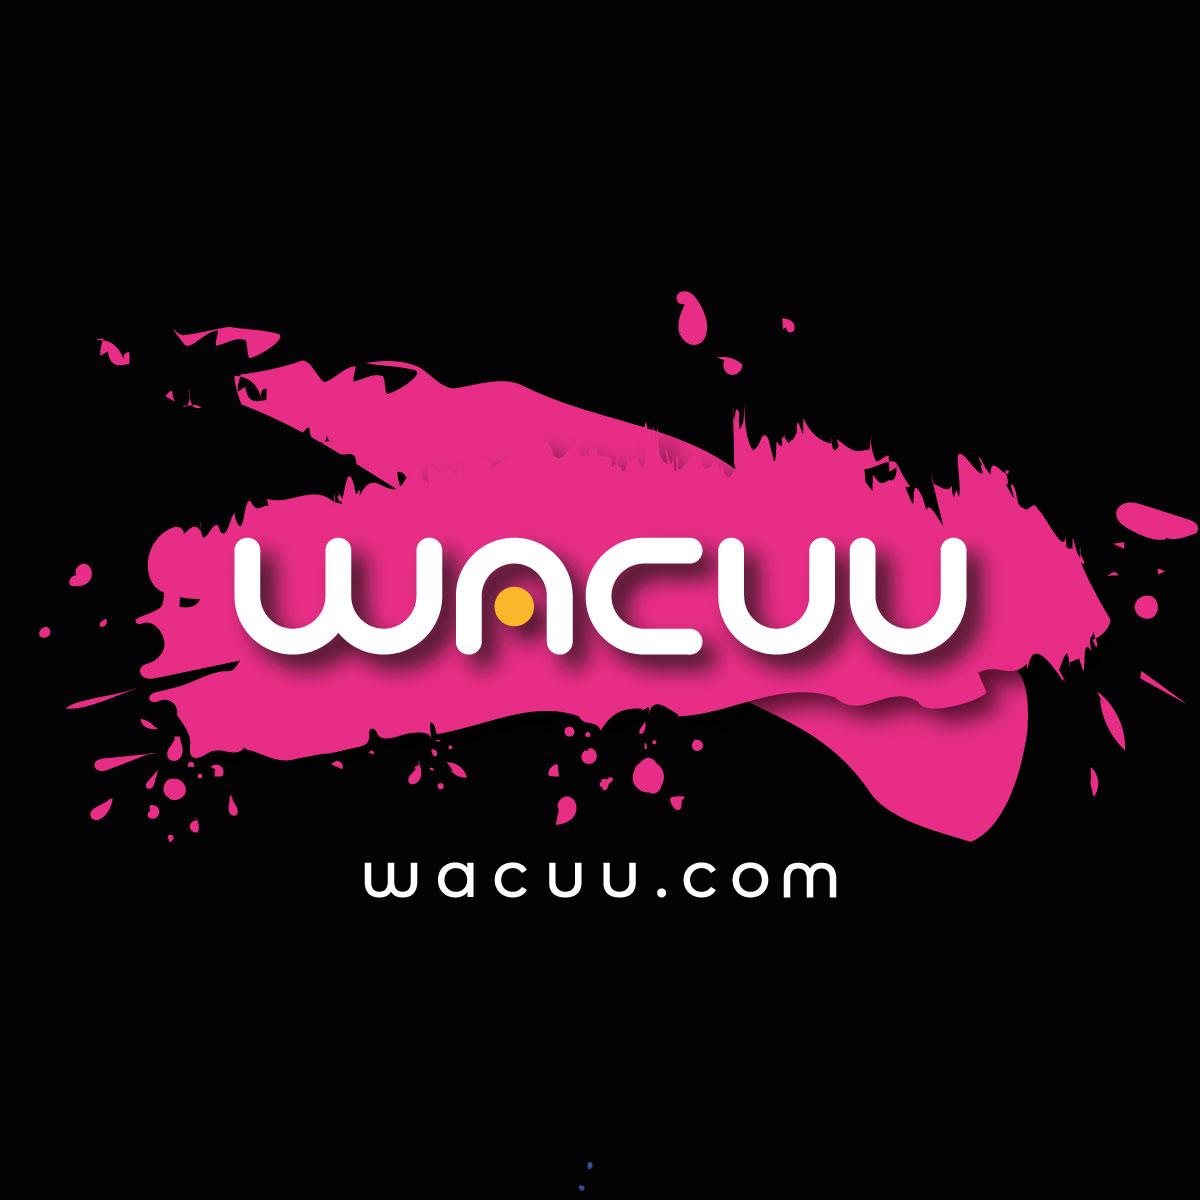 WACUU - BRANDING DESIGN BY BRANDIZLE